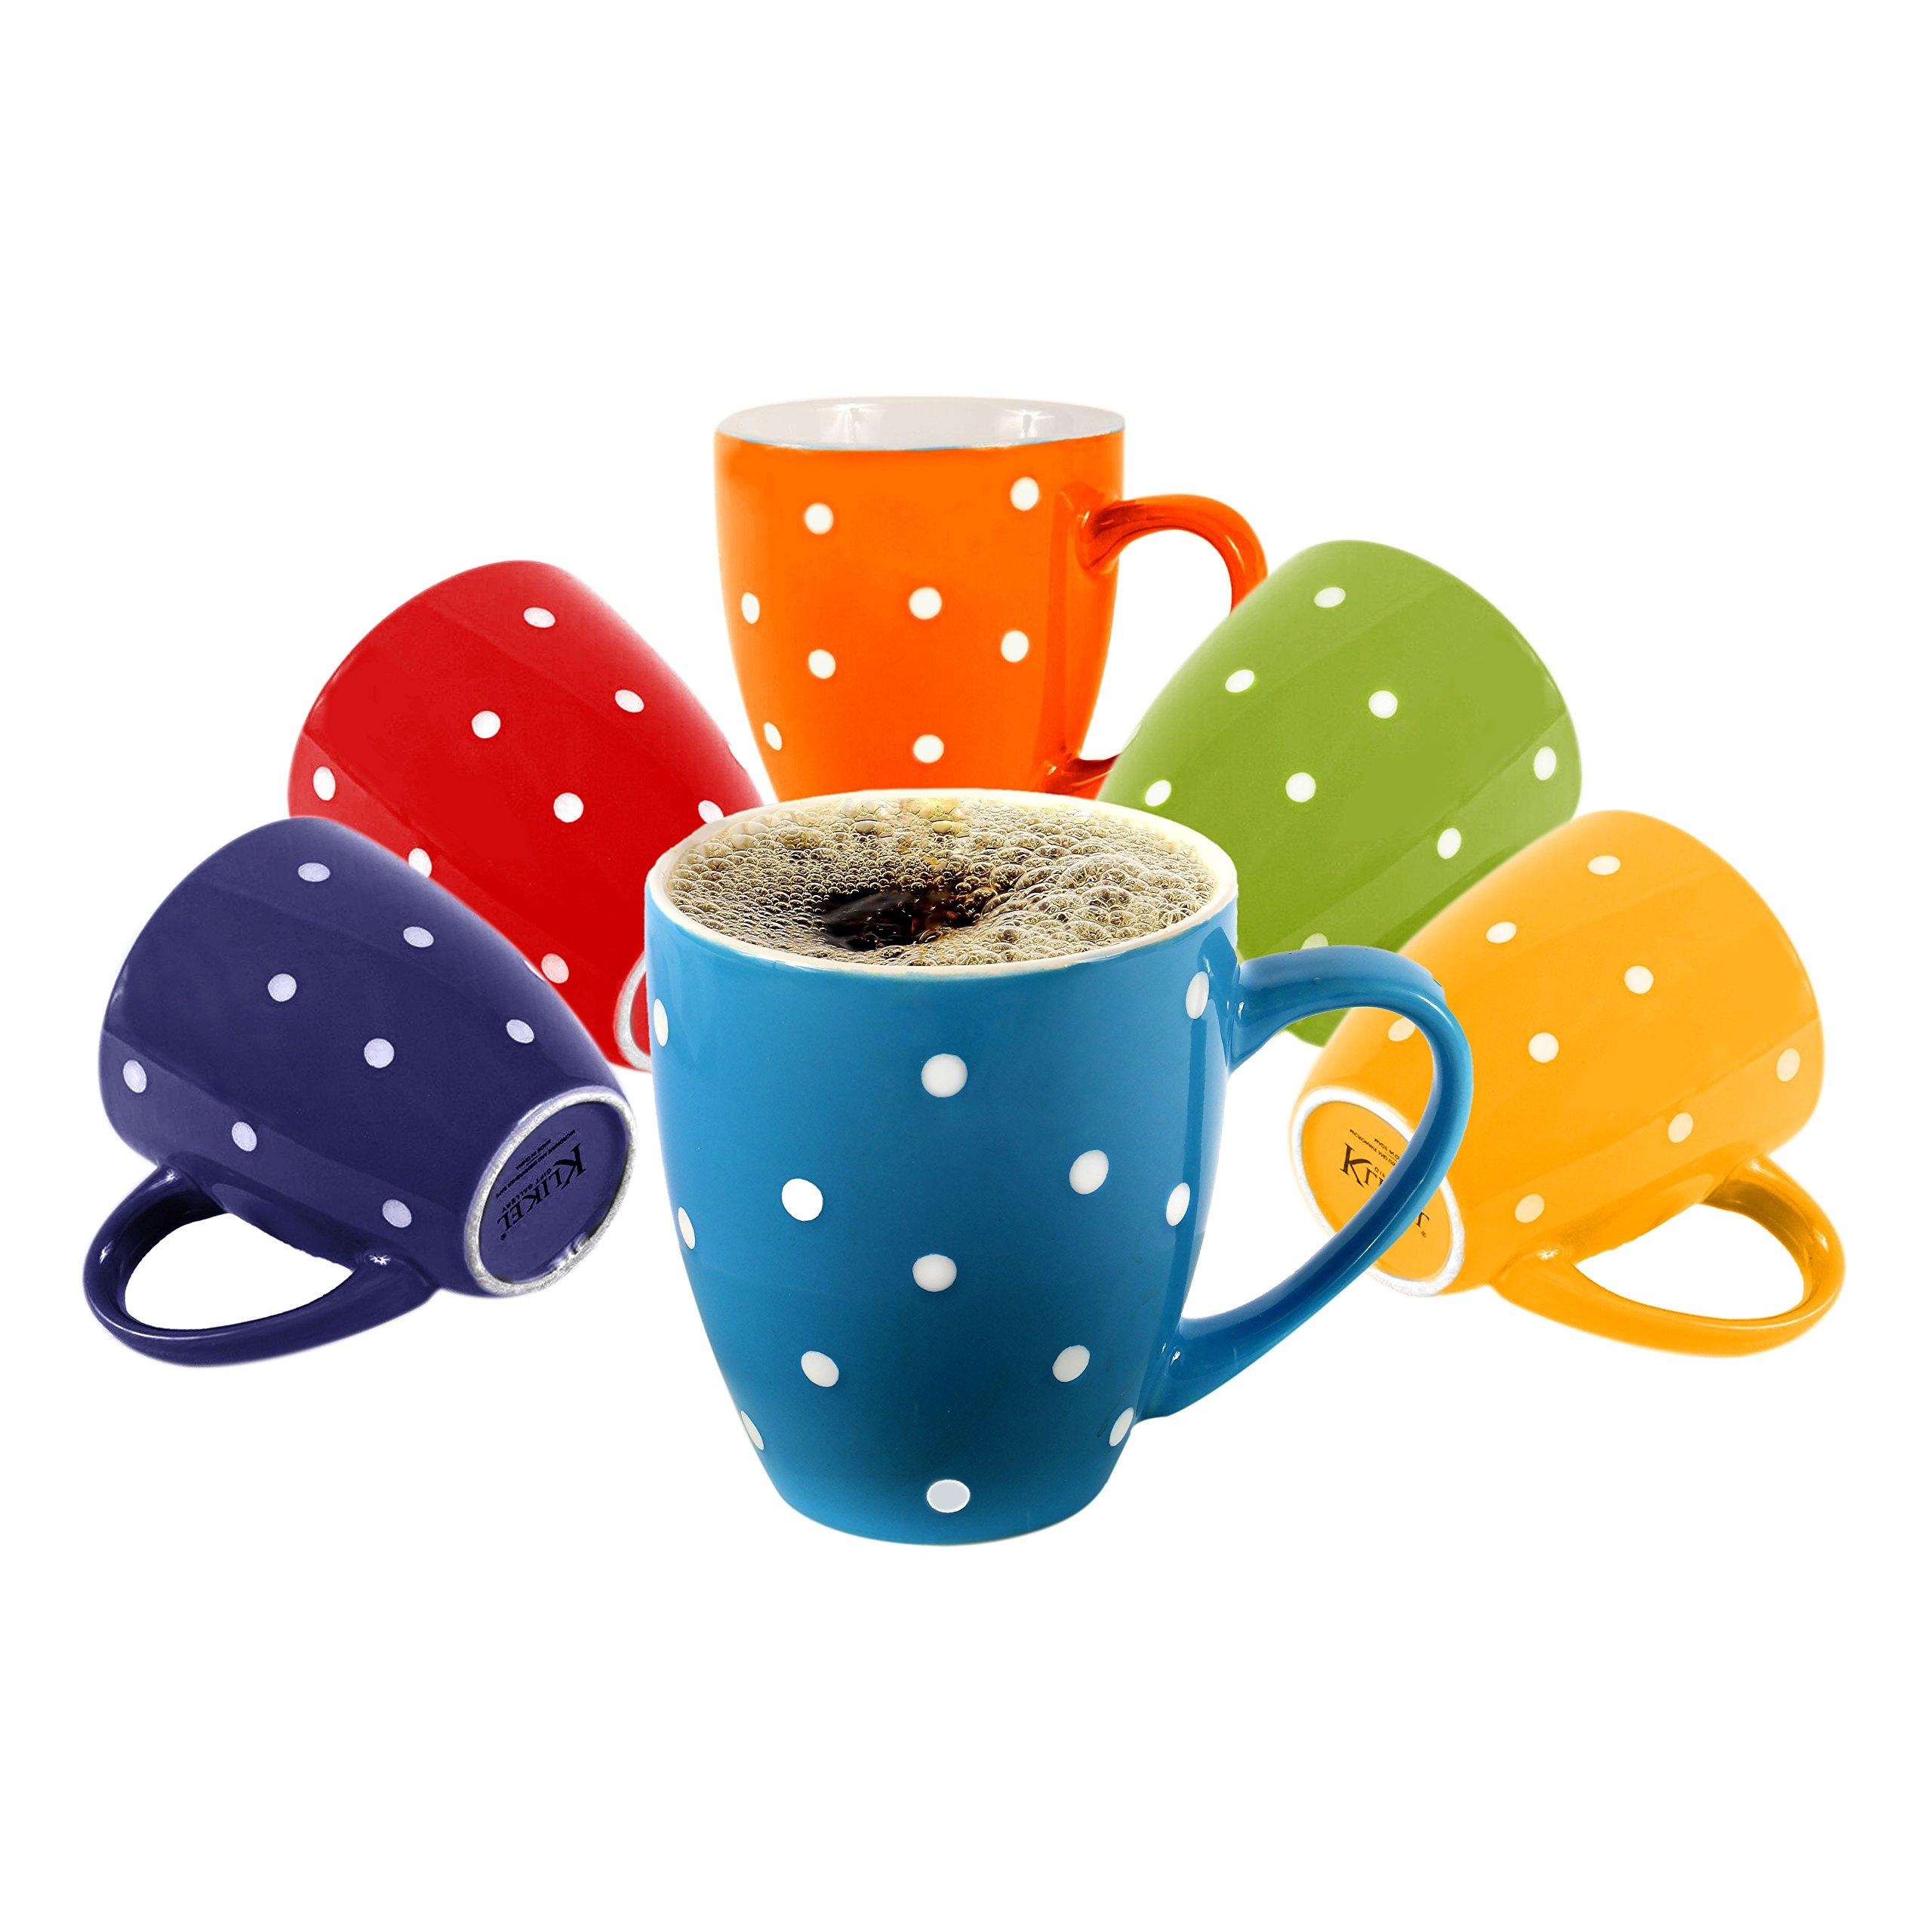 Klikel 6 Polka Dot Coffee Mugs 16oz Flat Bottom Porcelain Dinnerware, Assorted Colors